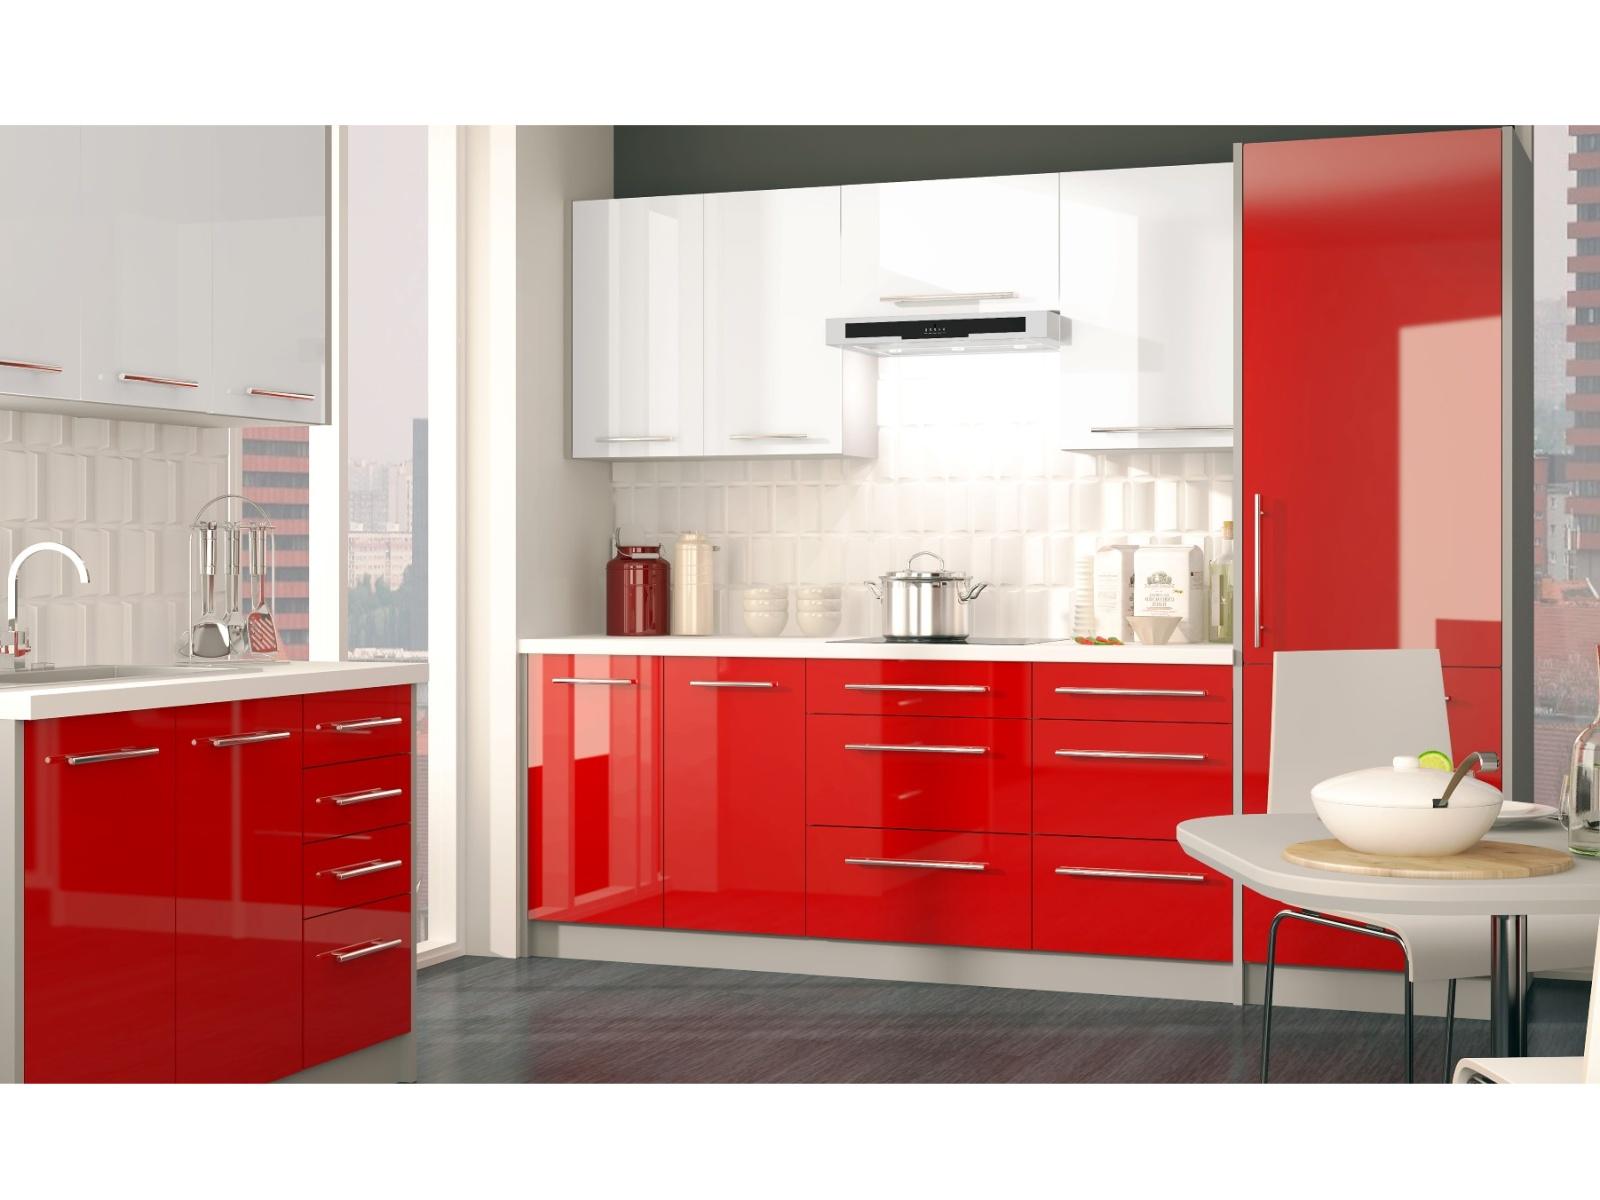 Extom Rohová kuchyně PLATINUM 370 cm, VZOROVÁ SESTAVA, white+rose red